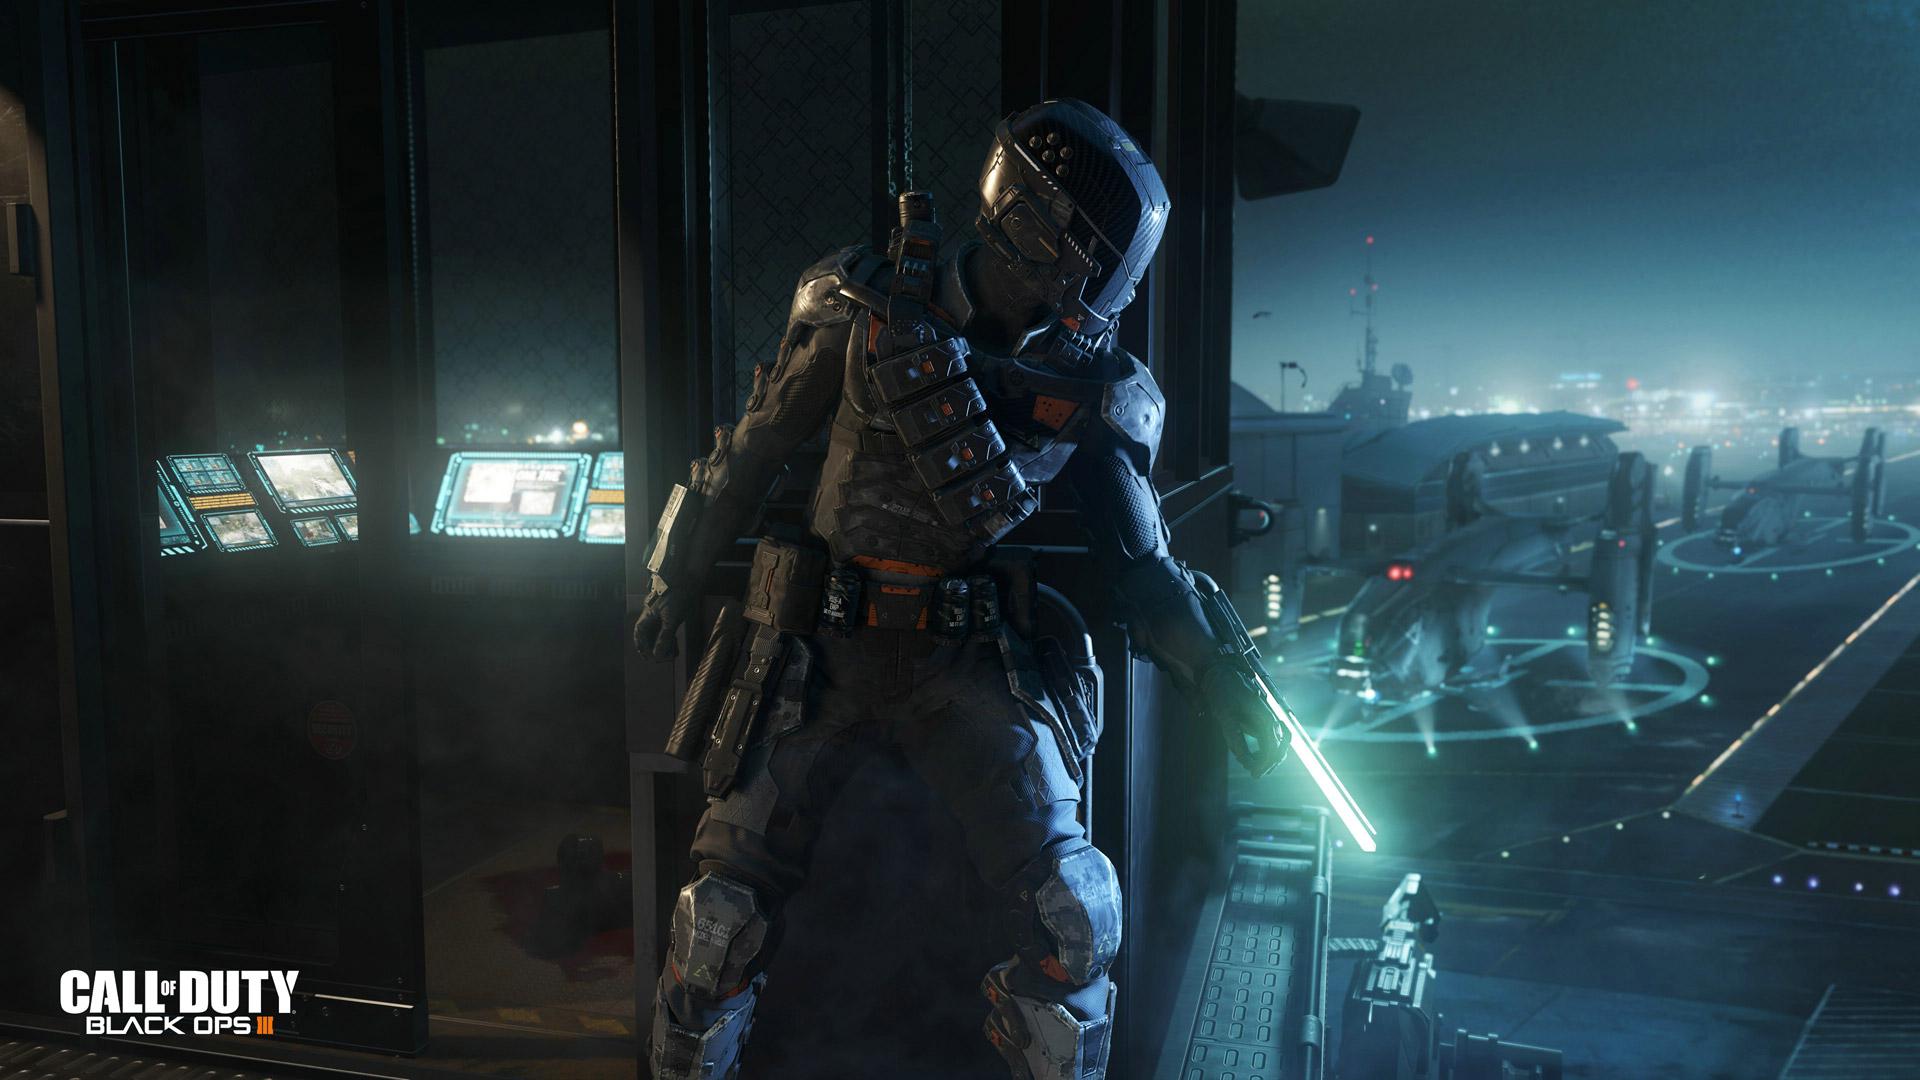 Call of Duty Black Ops 3 wallpaper 5 1920x1080